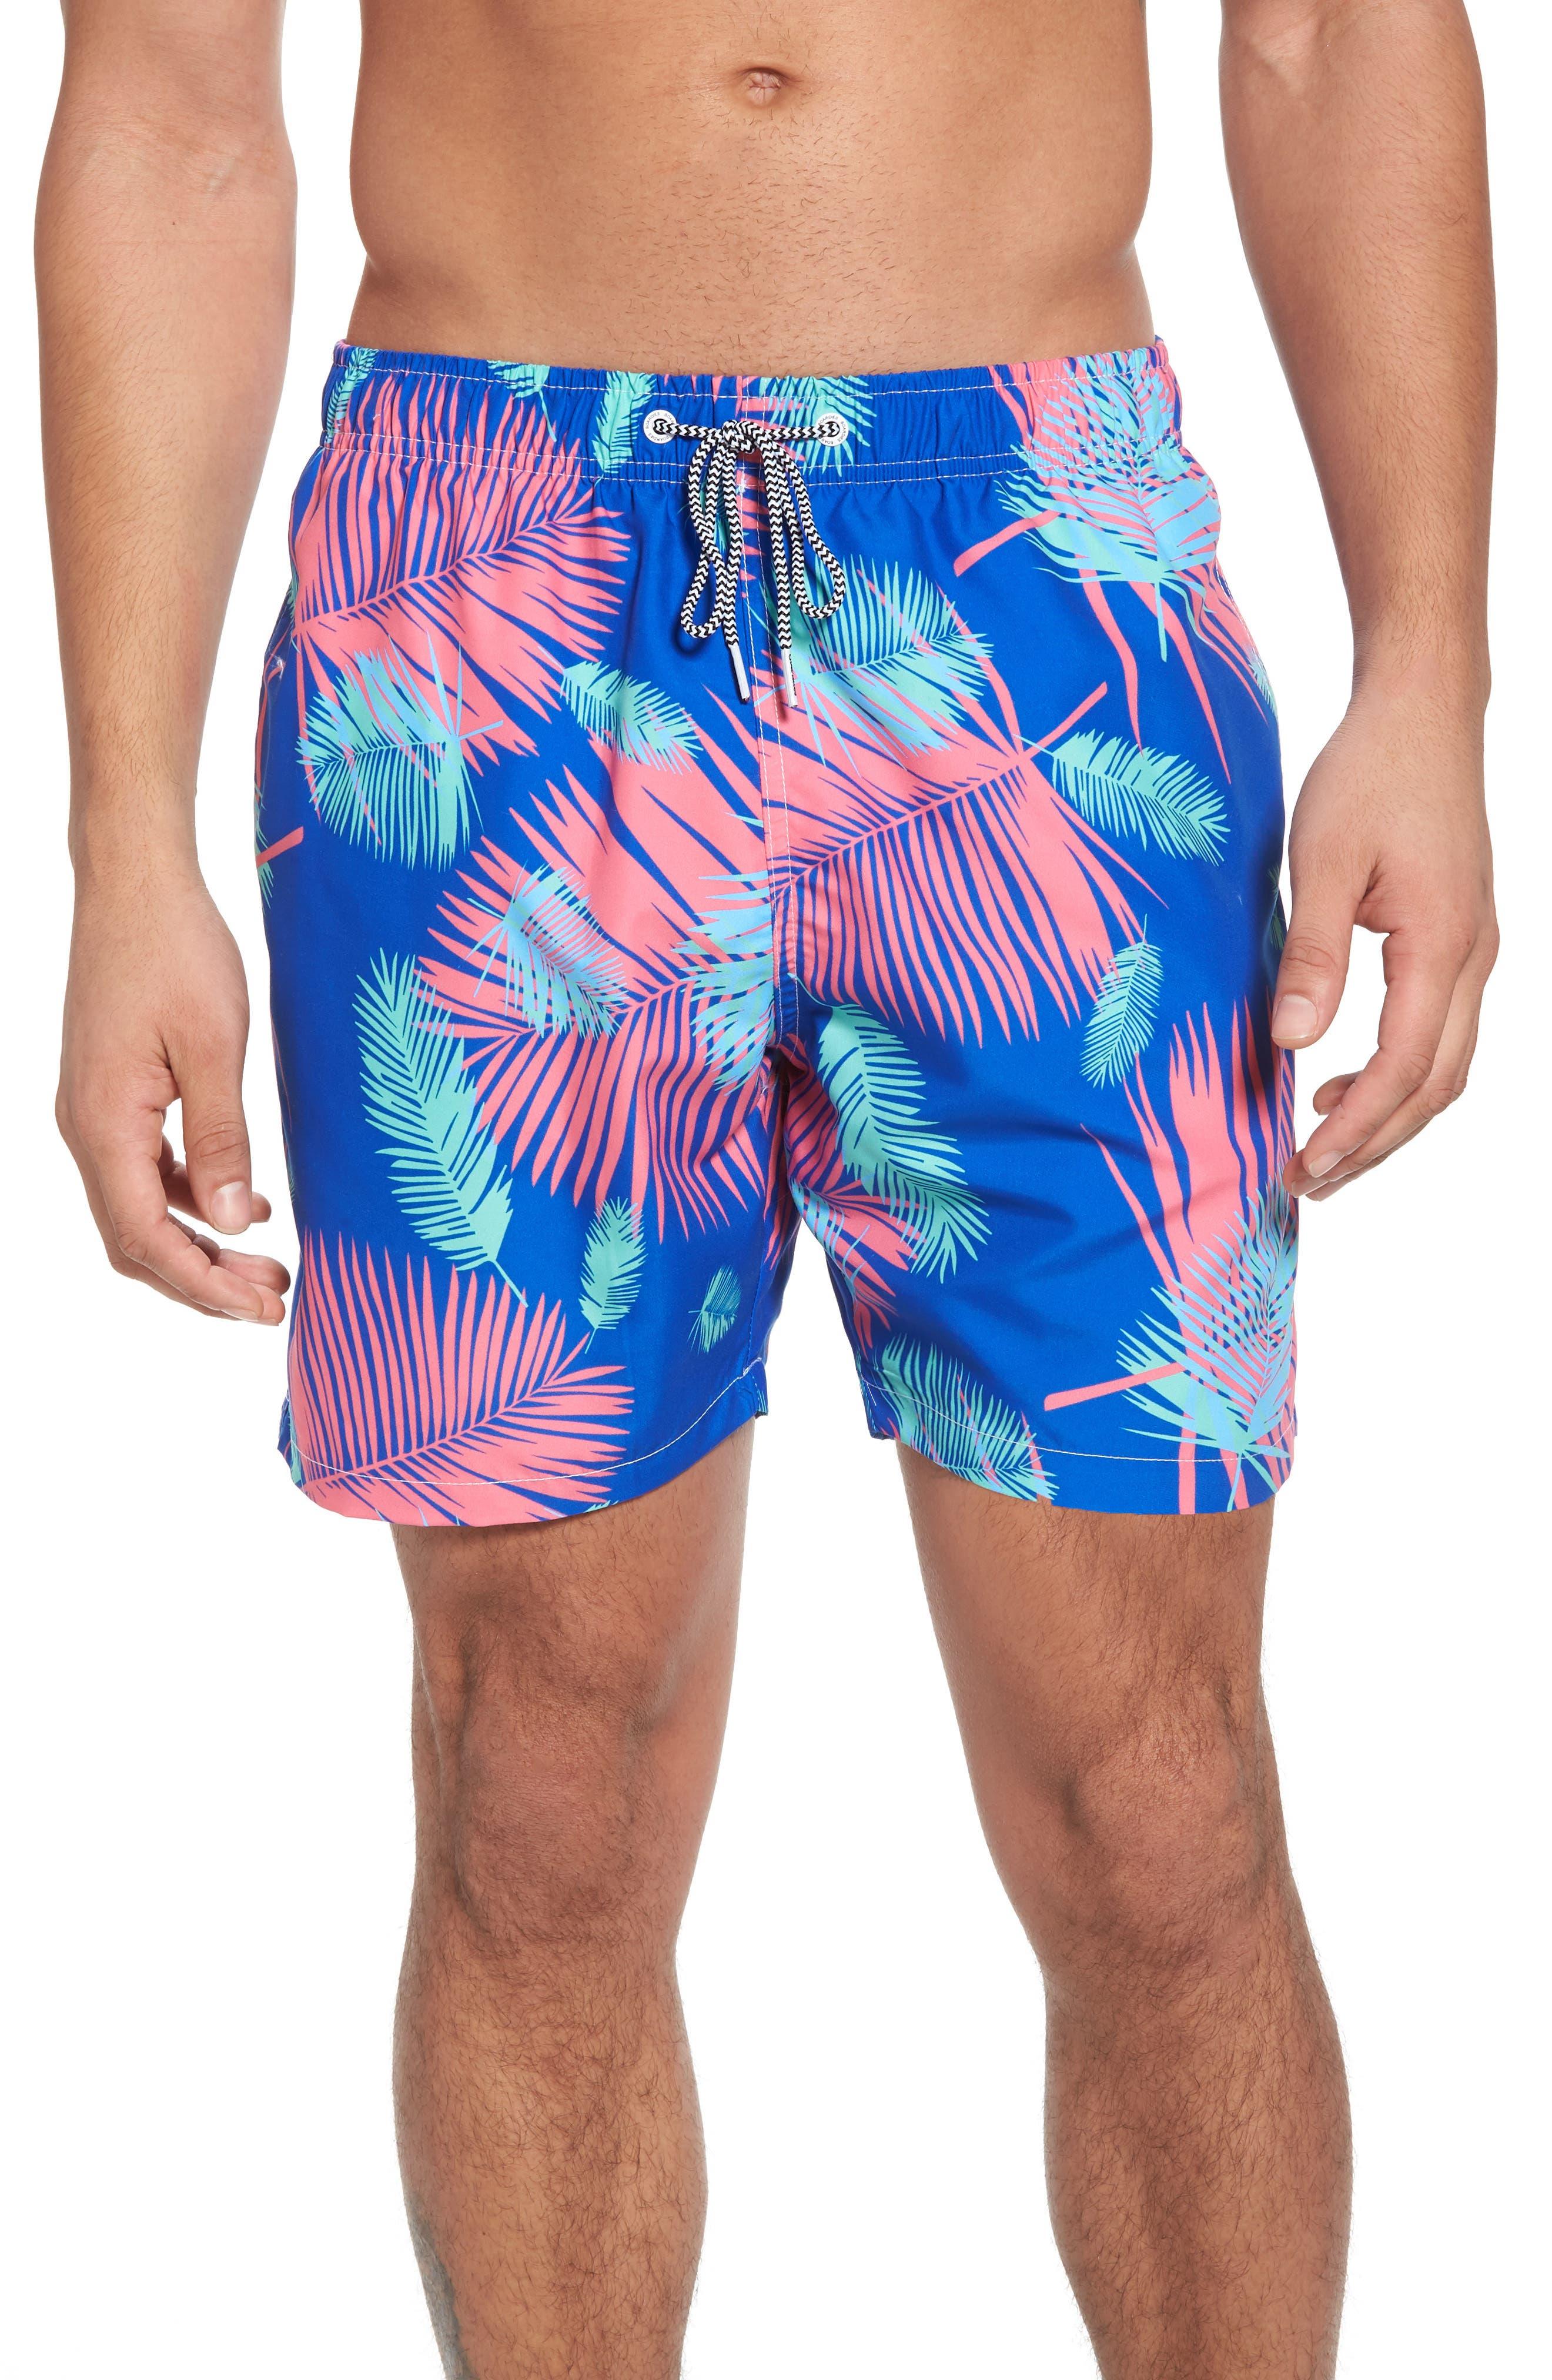 Tropicano Swim Trunks,                         Main,                         color, 400